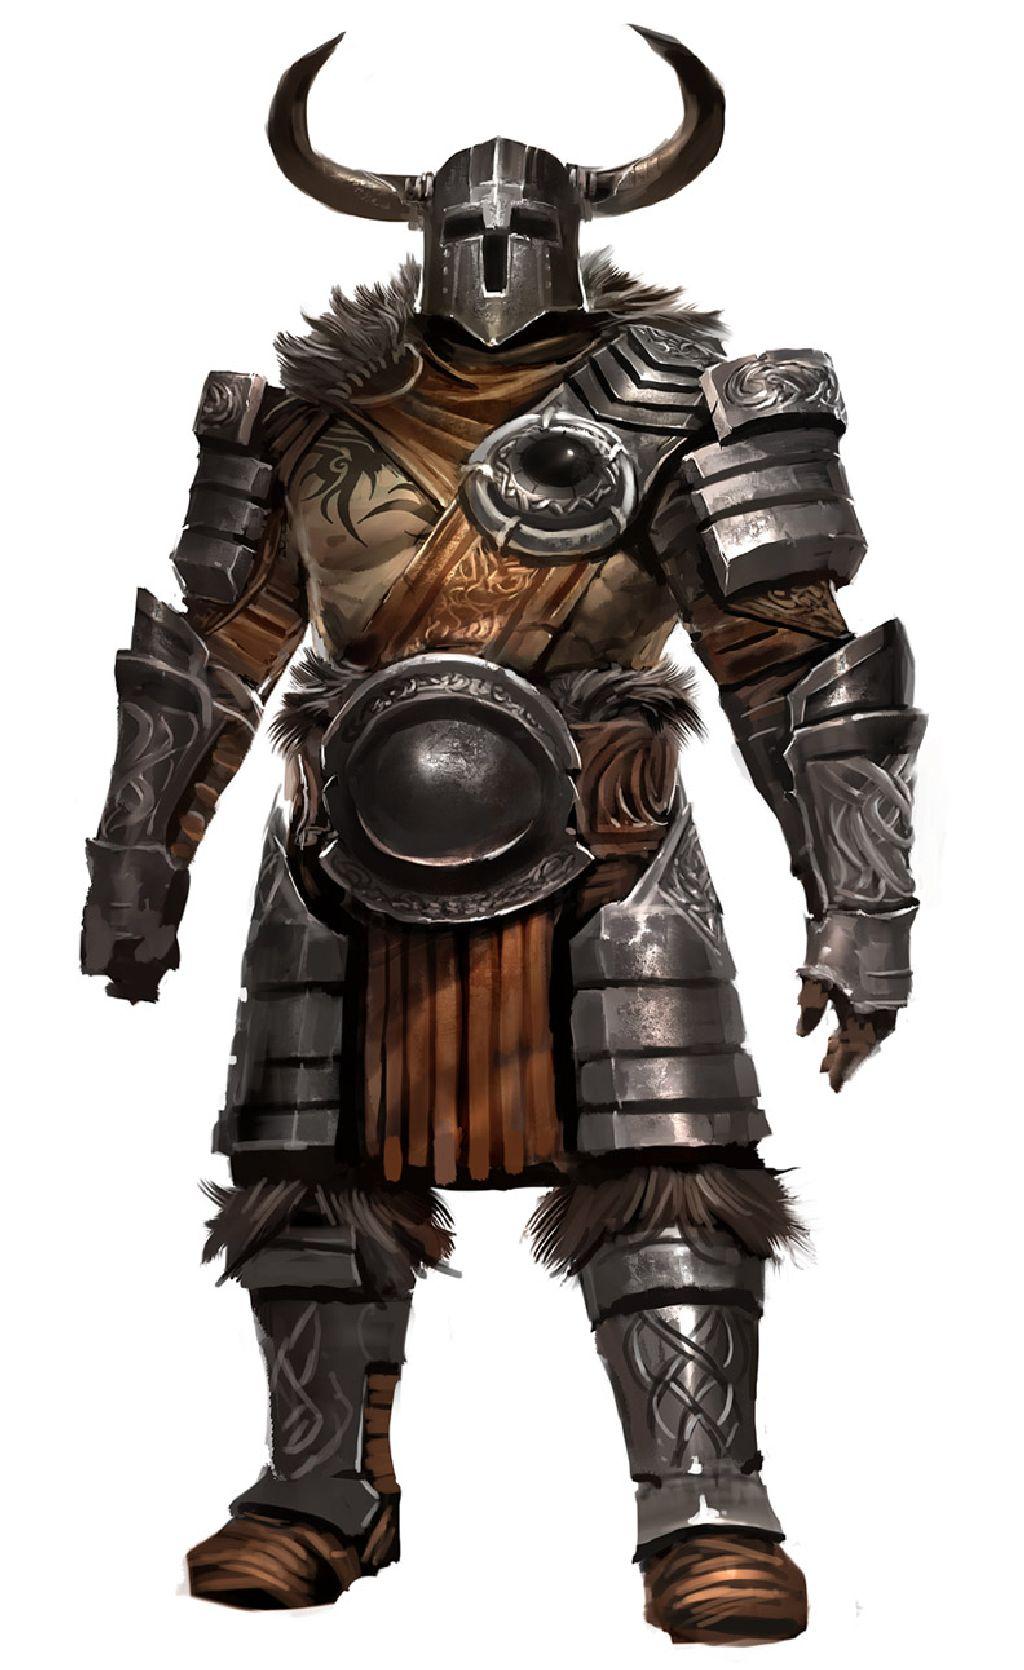 guild wars 2 armor - photo #32